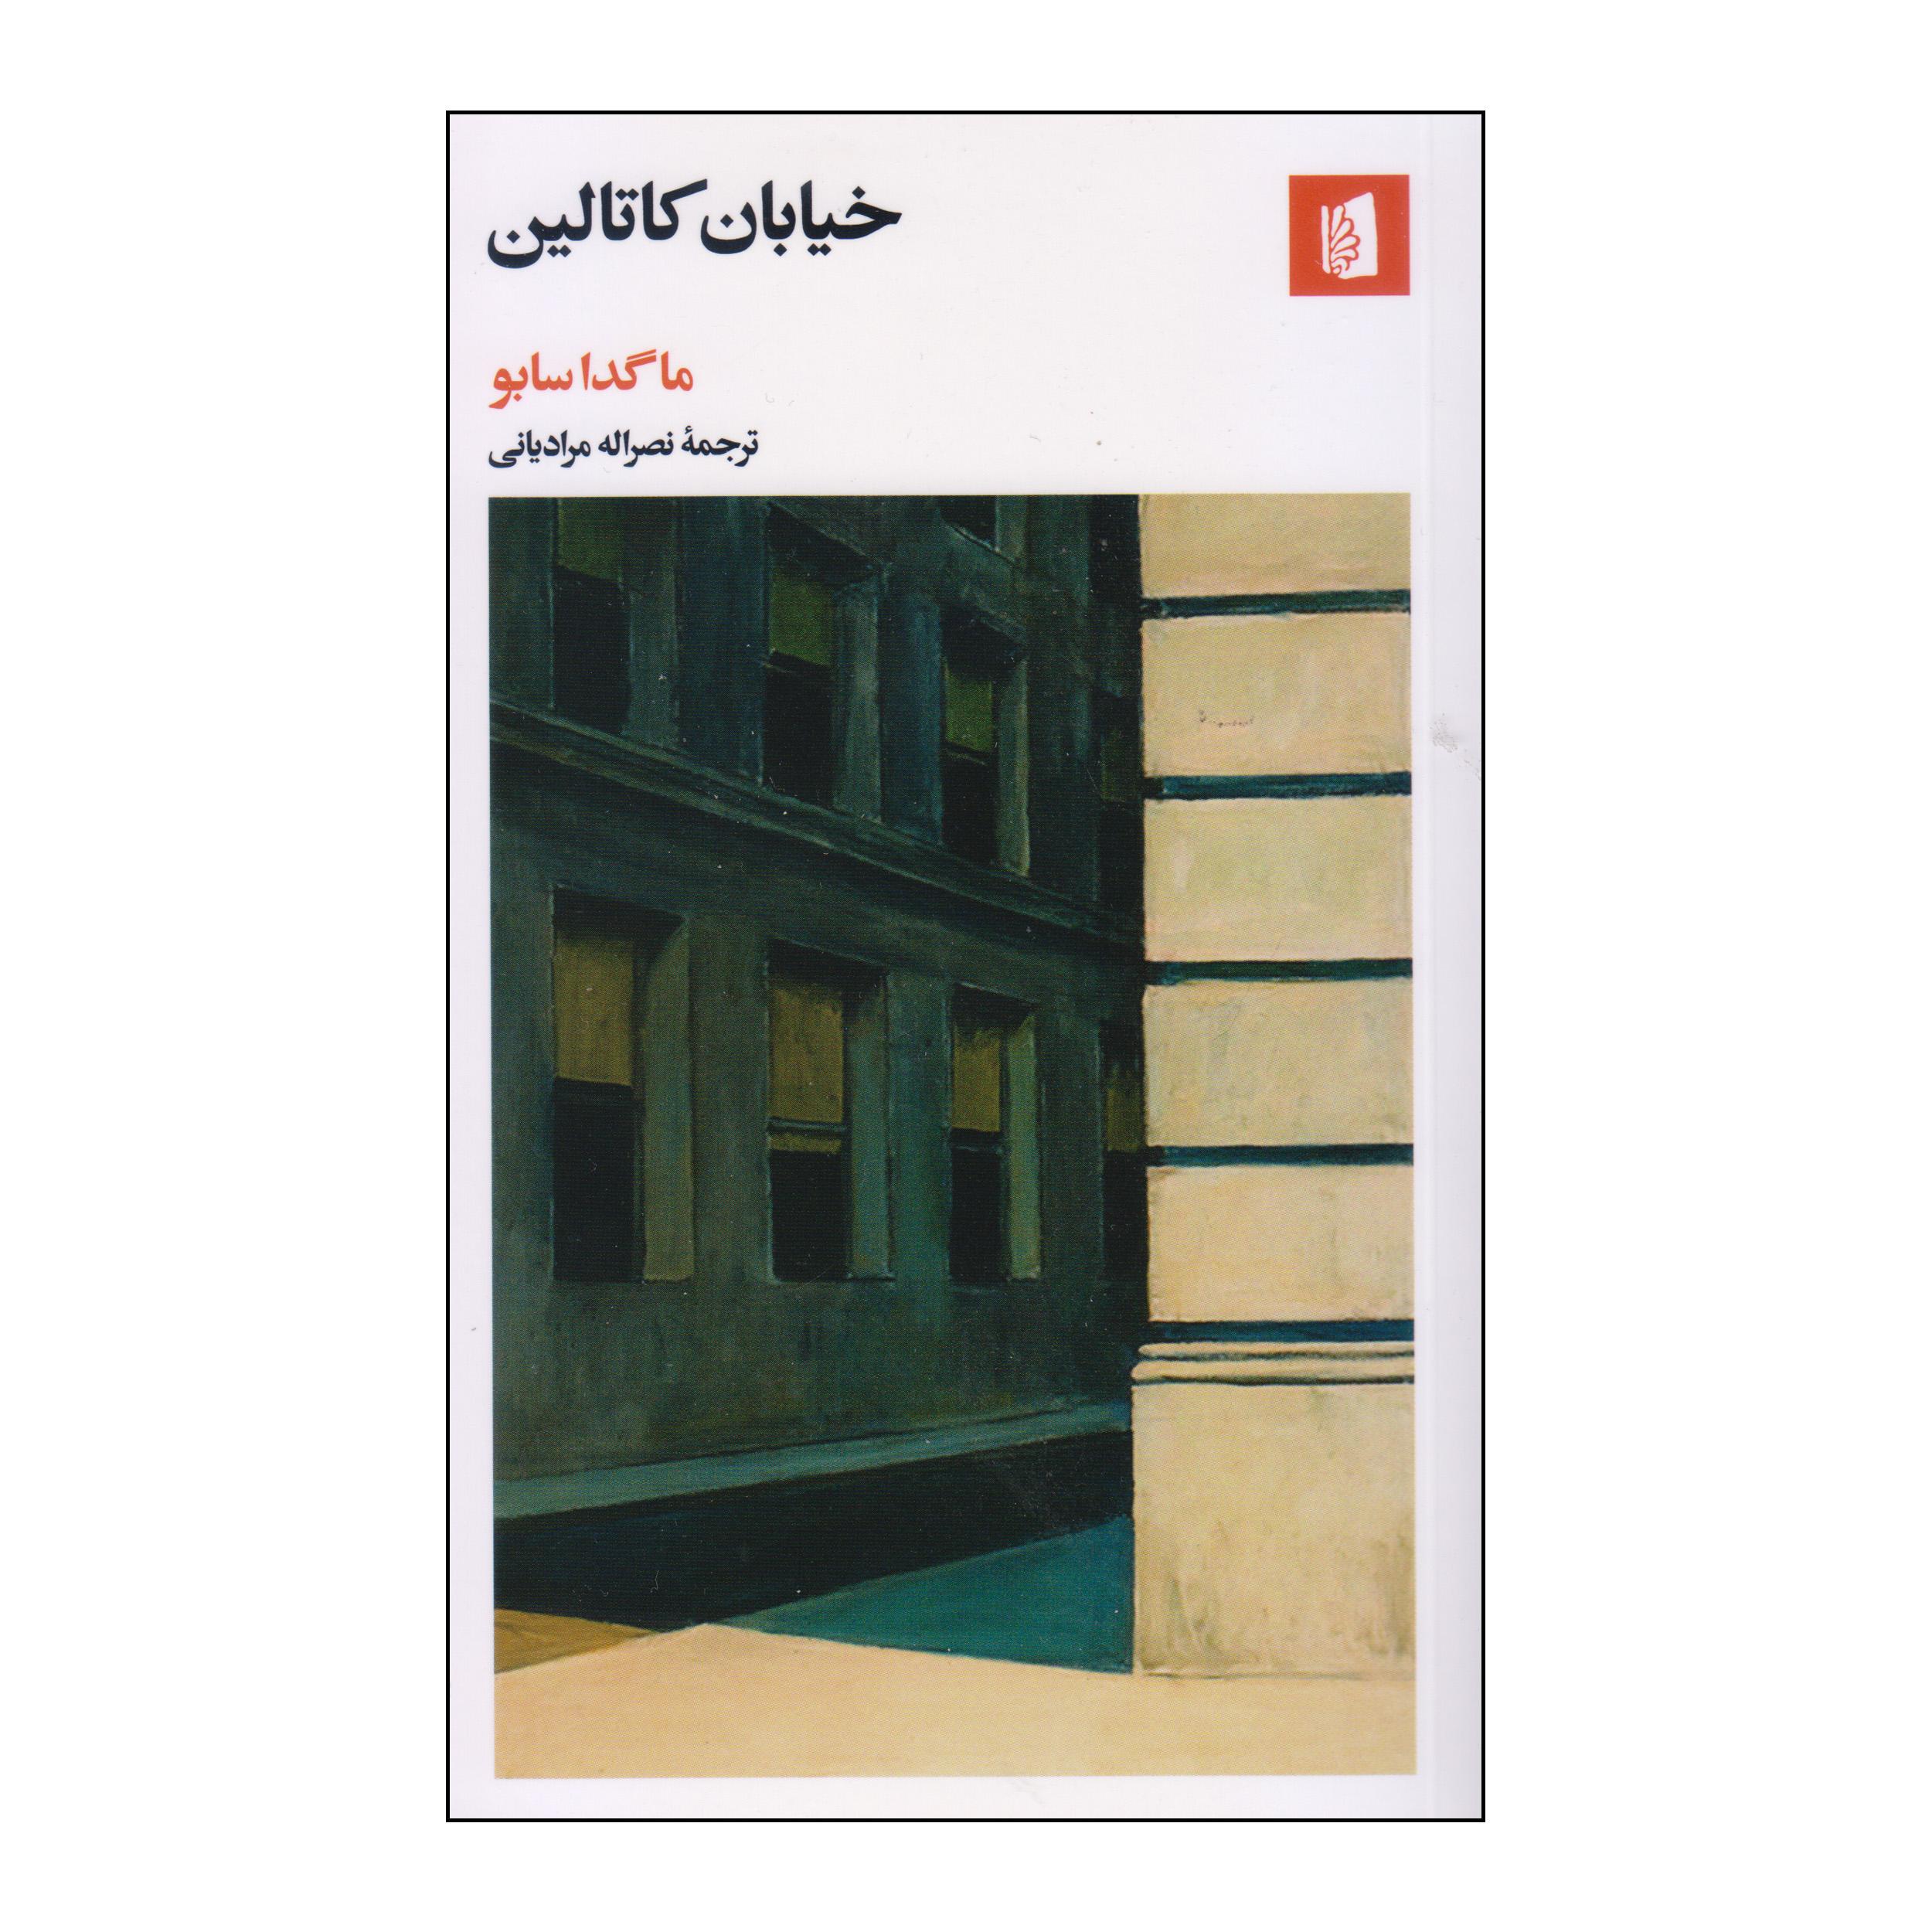 خرید                      کتاب خیابان کاتالین اثر ماگدا سابو نشر بیدگل